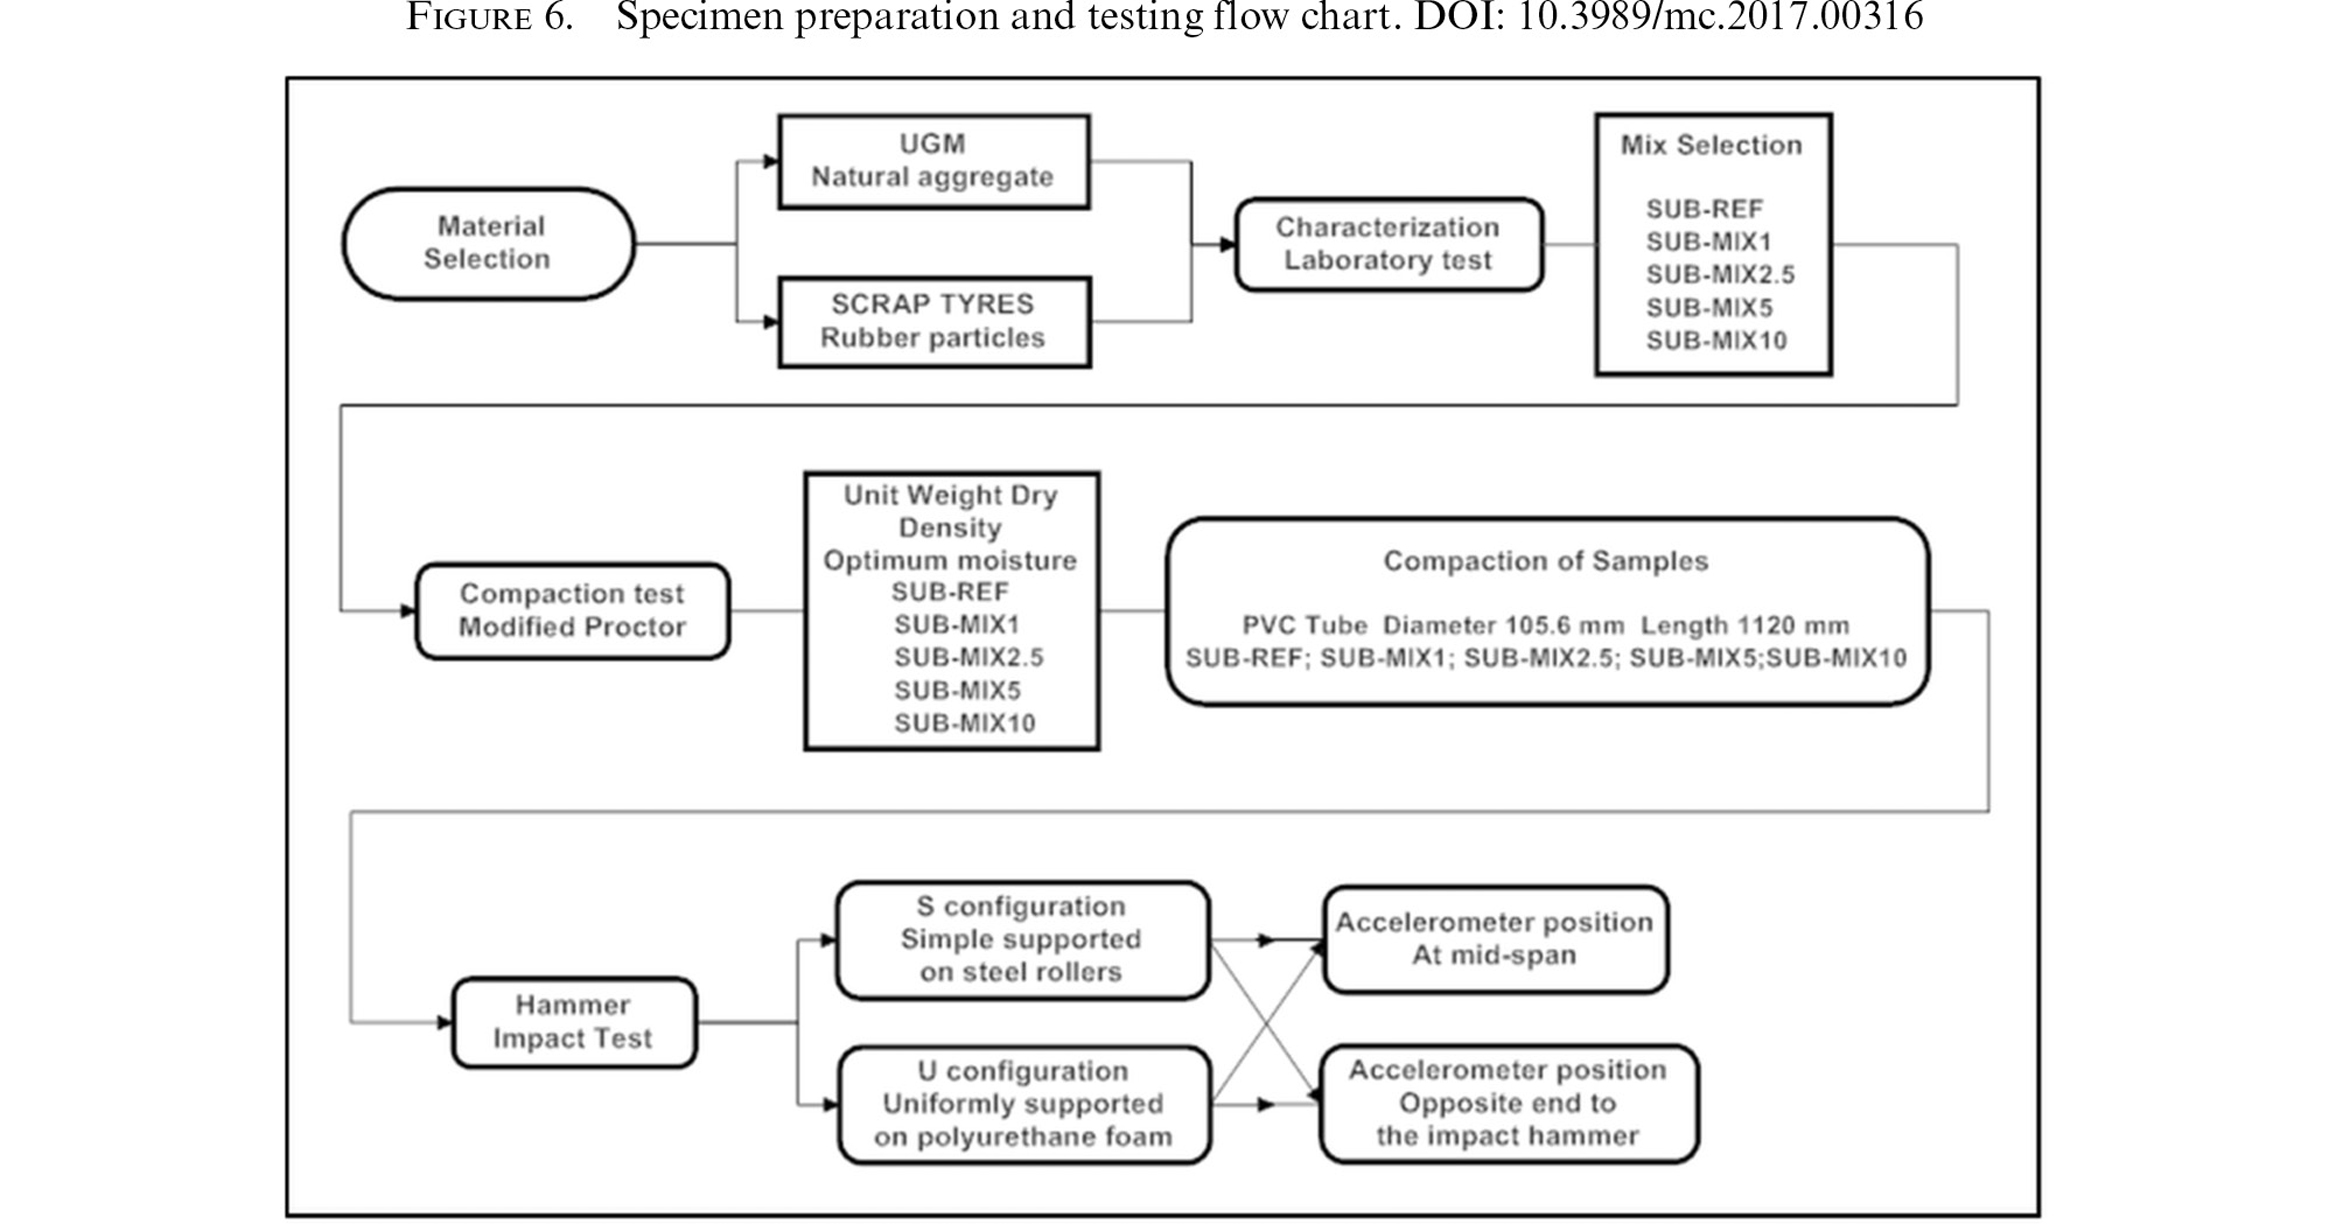 Use Of Rubber Shreds To Enhance Attenuation Railway Sub Ballast Process Flow Diagram Nylon 6 Figure Specimen Preparation And Testing Chart